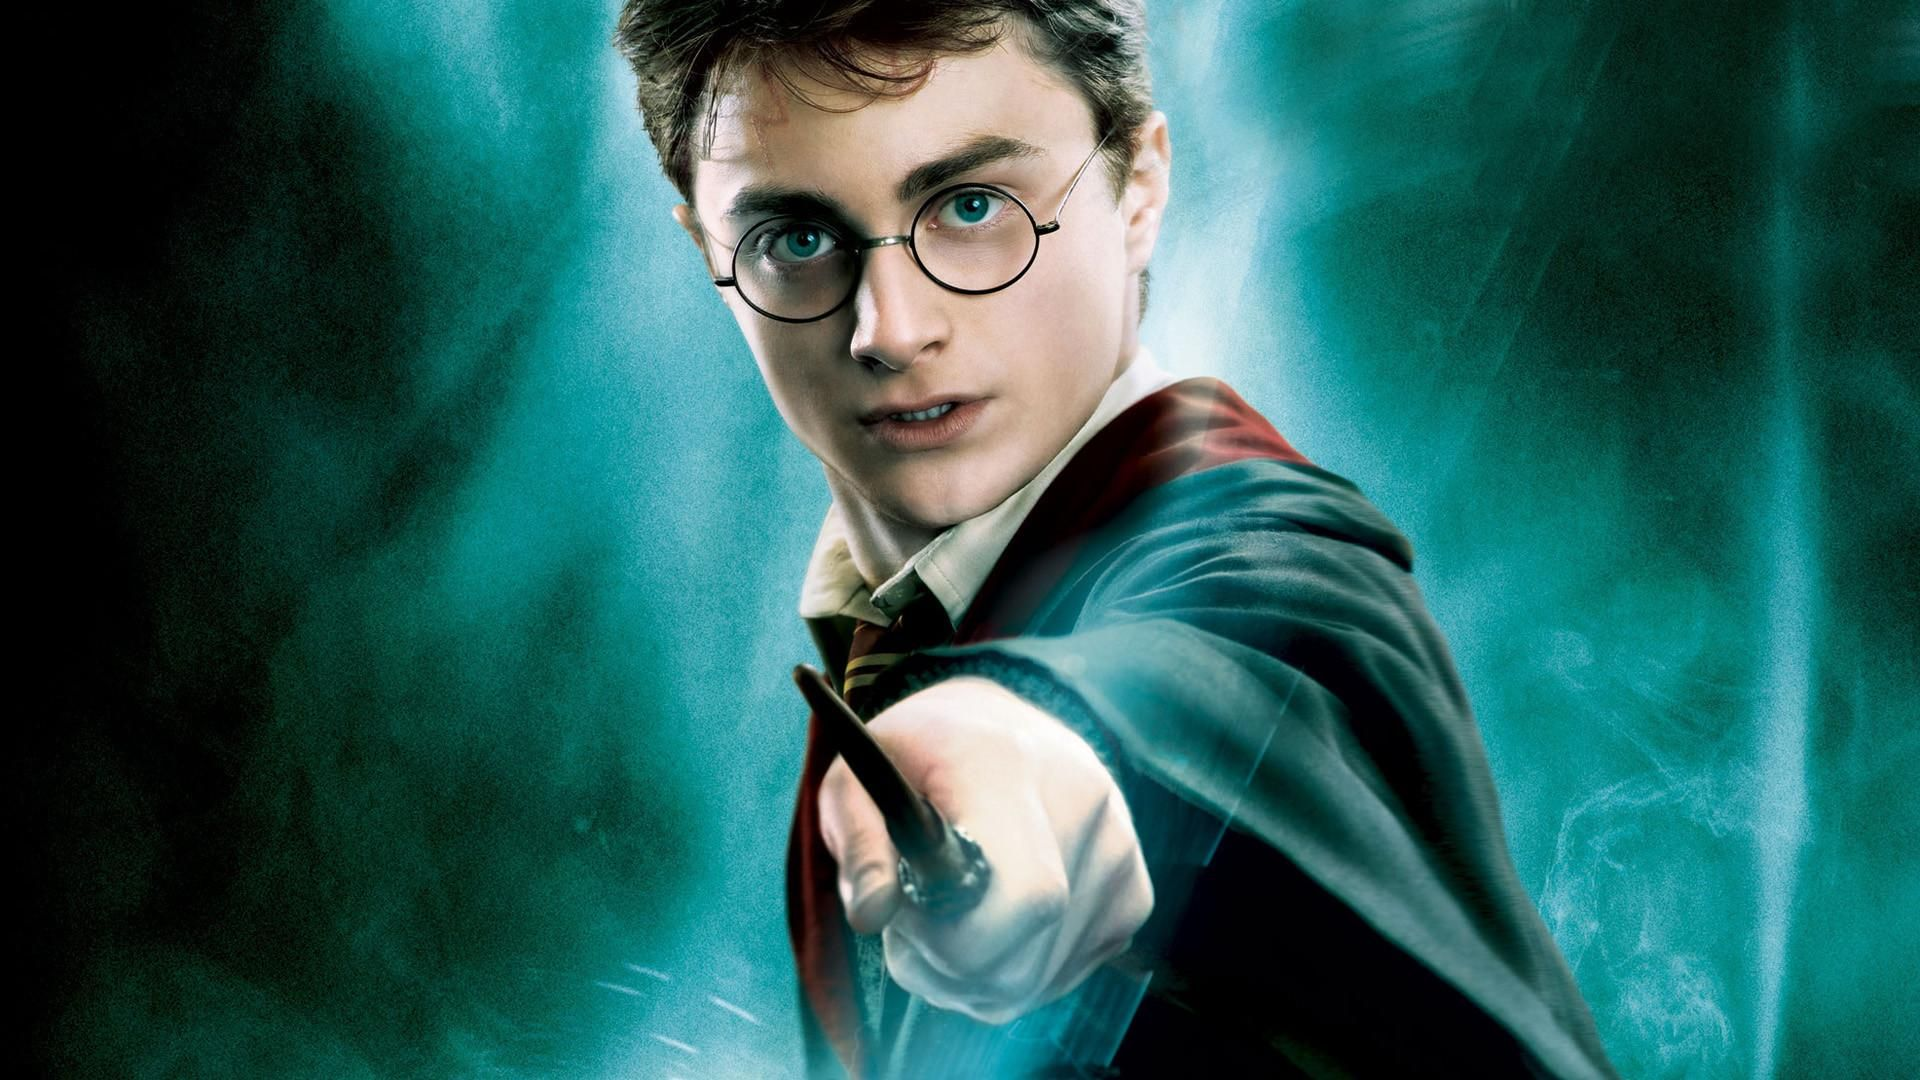 http://www.feinschwarz.net/wp-content/uploads/2017/04/Harry_Potter_in_Teil_5_2.jpg